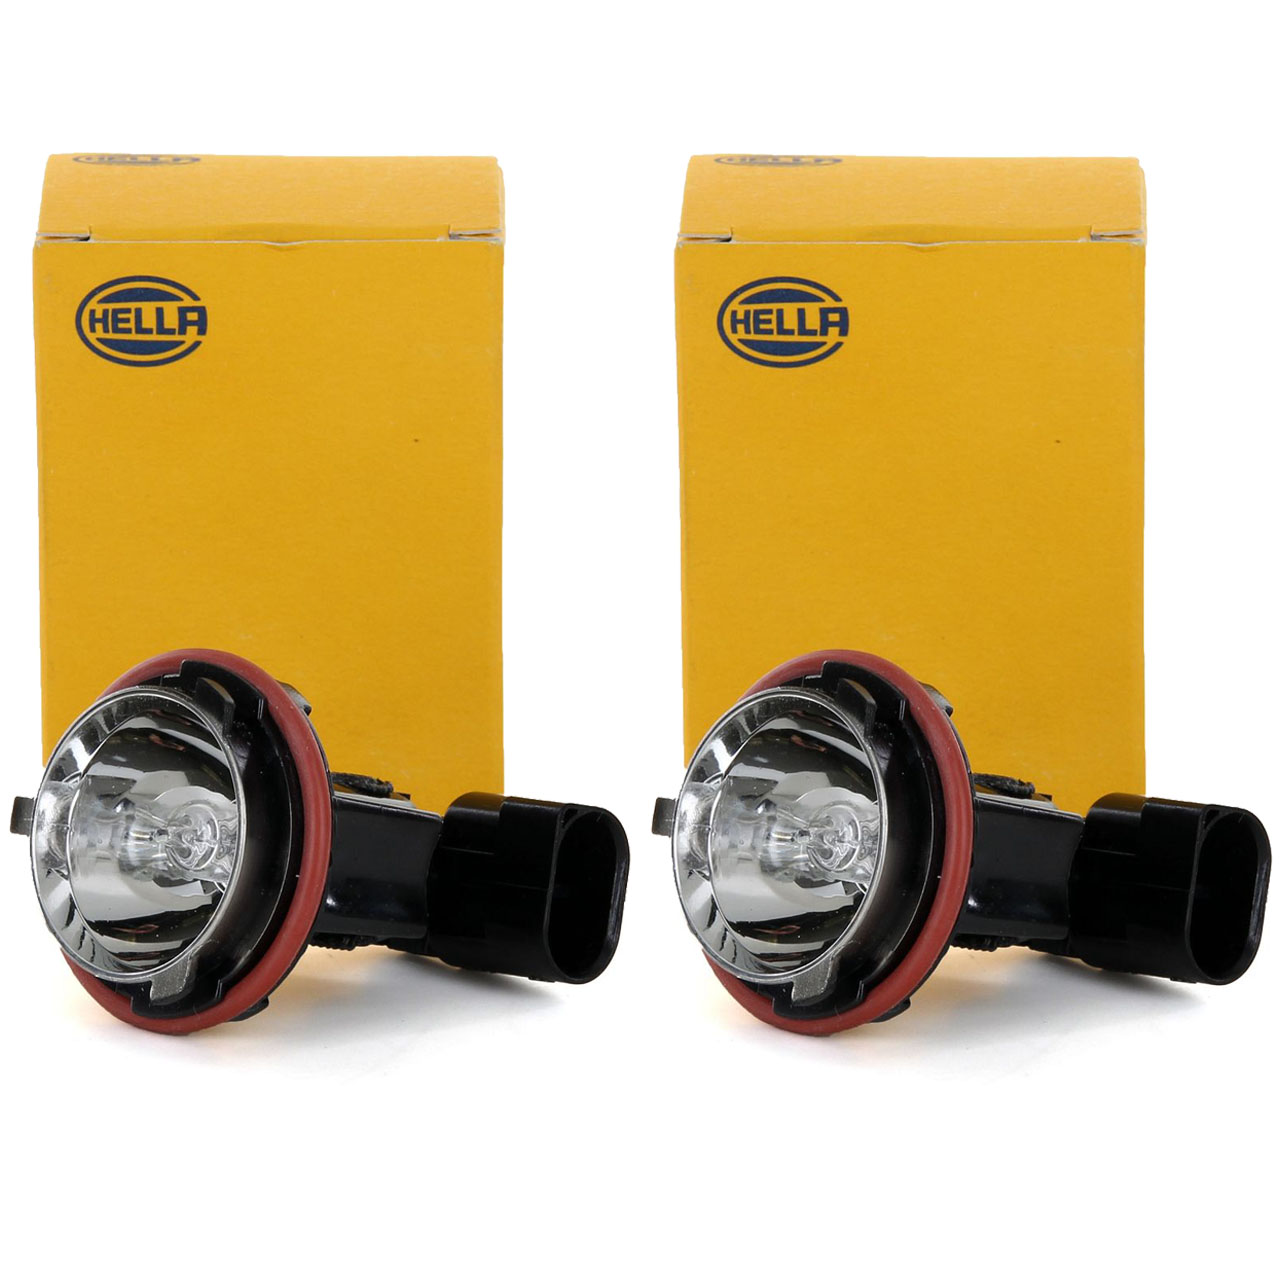 2x HELLA Lampenfassung Halogen Lampe Standlicht H10W für BMW E81 E87 E39 E63 E64